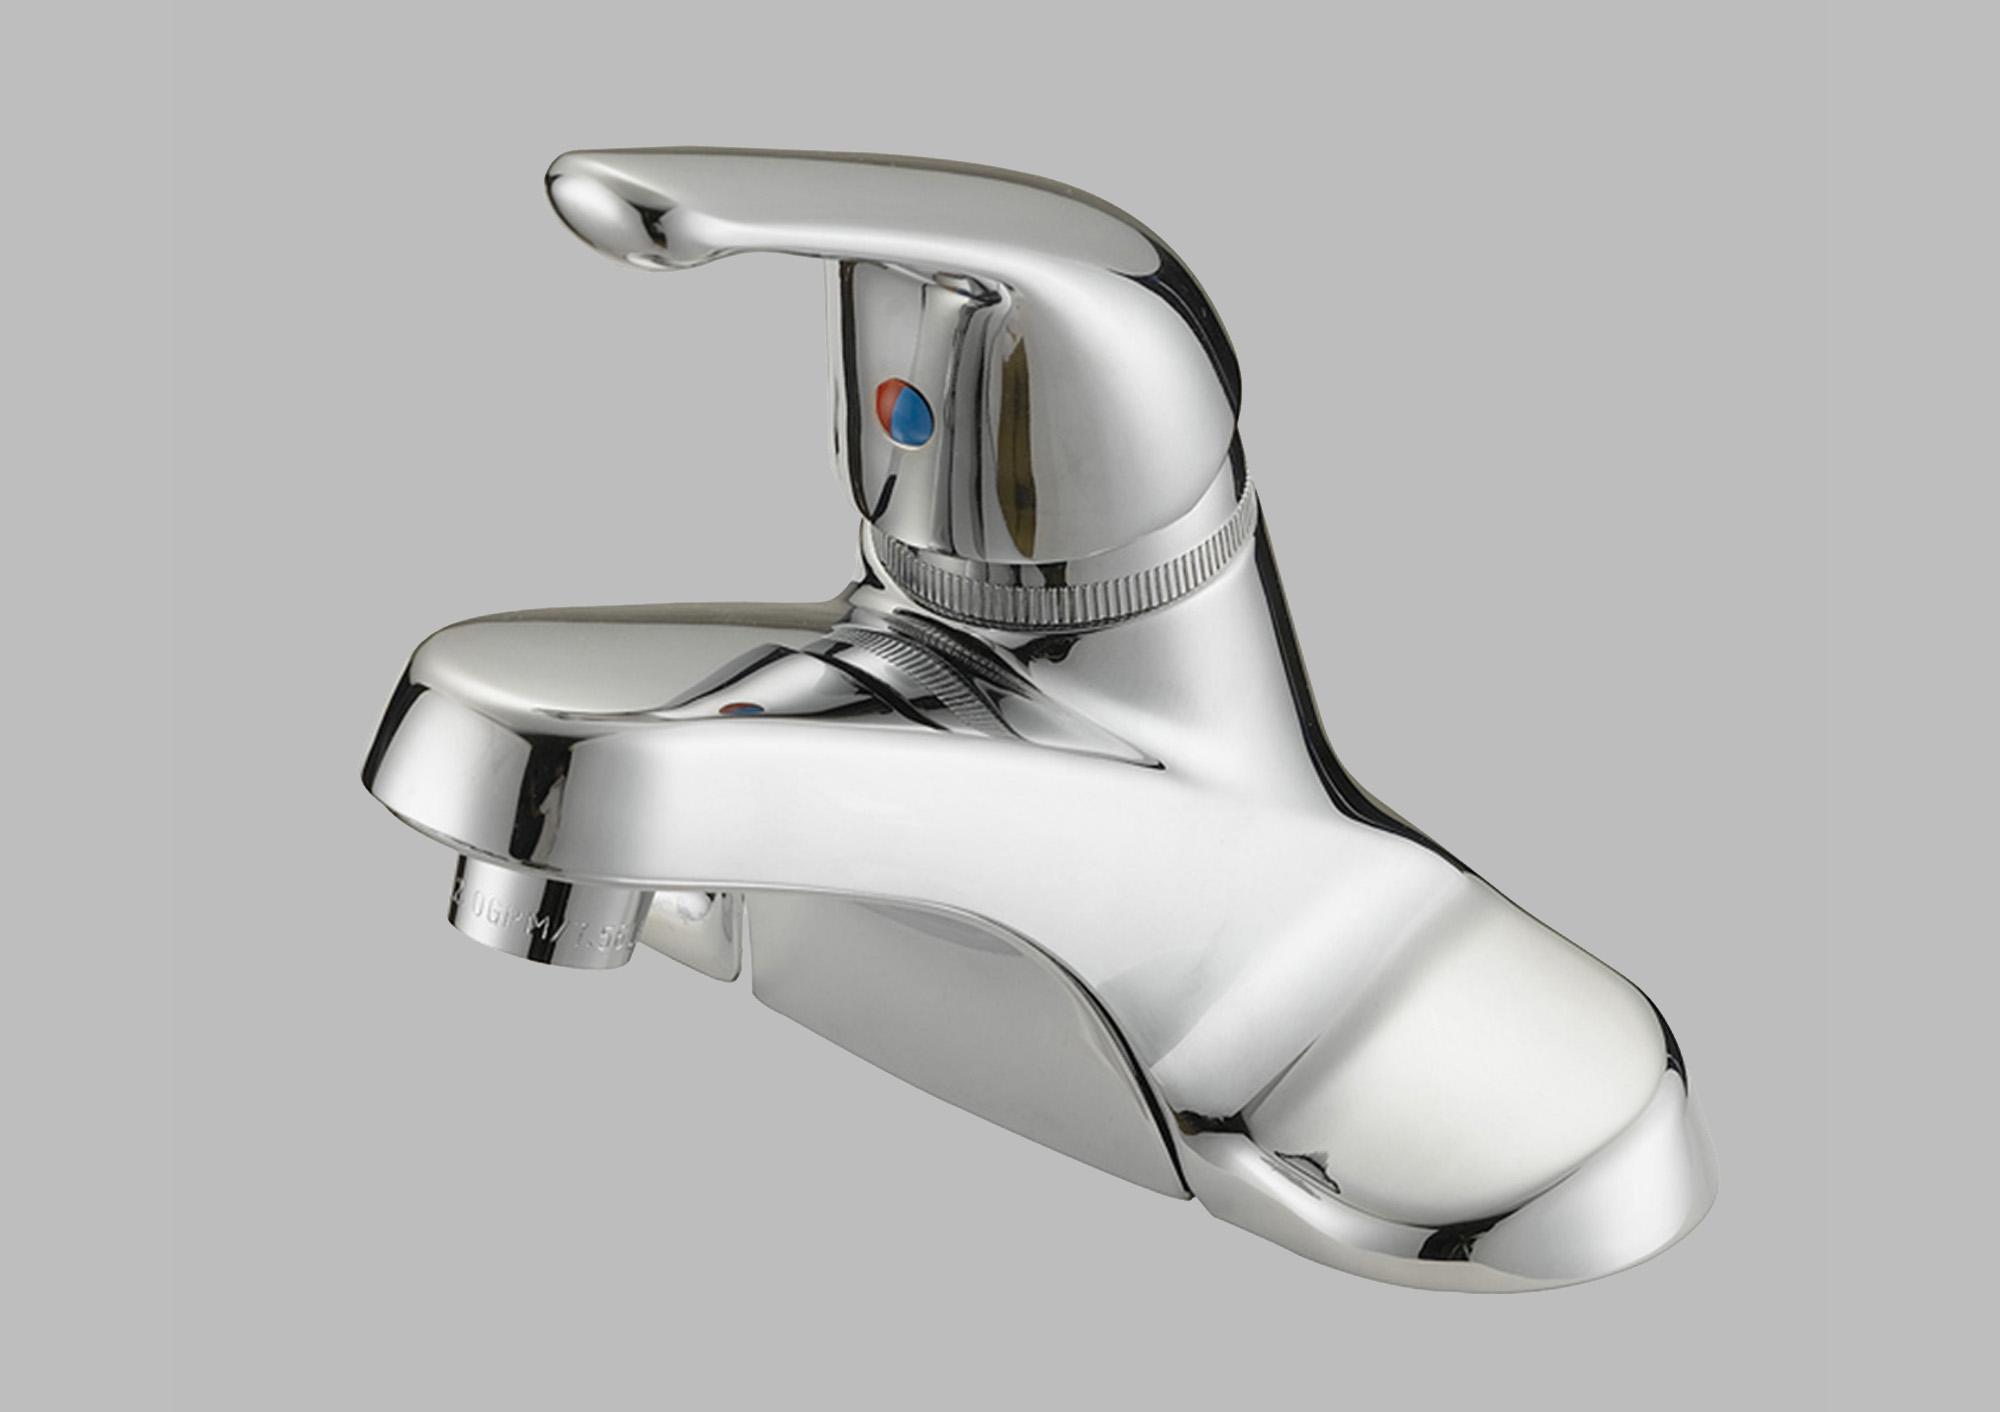 LessCare Bathroom Faucet Model LB2C JACKS Building